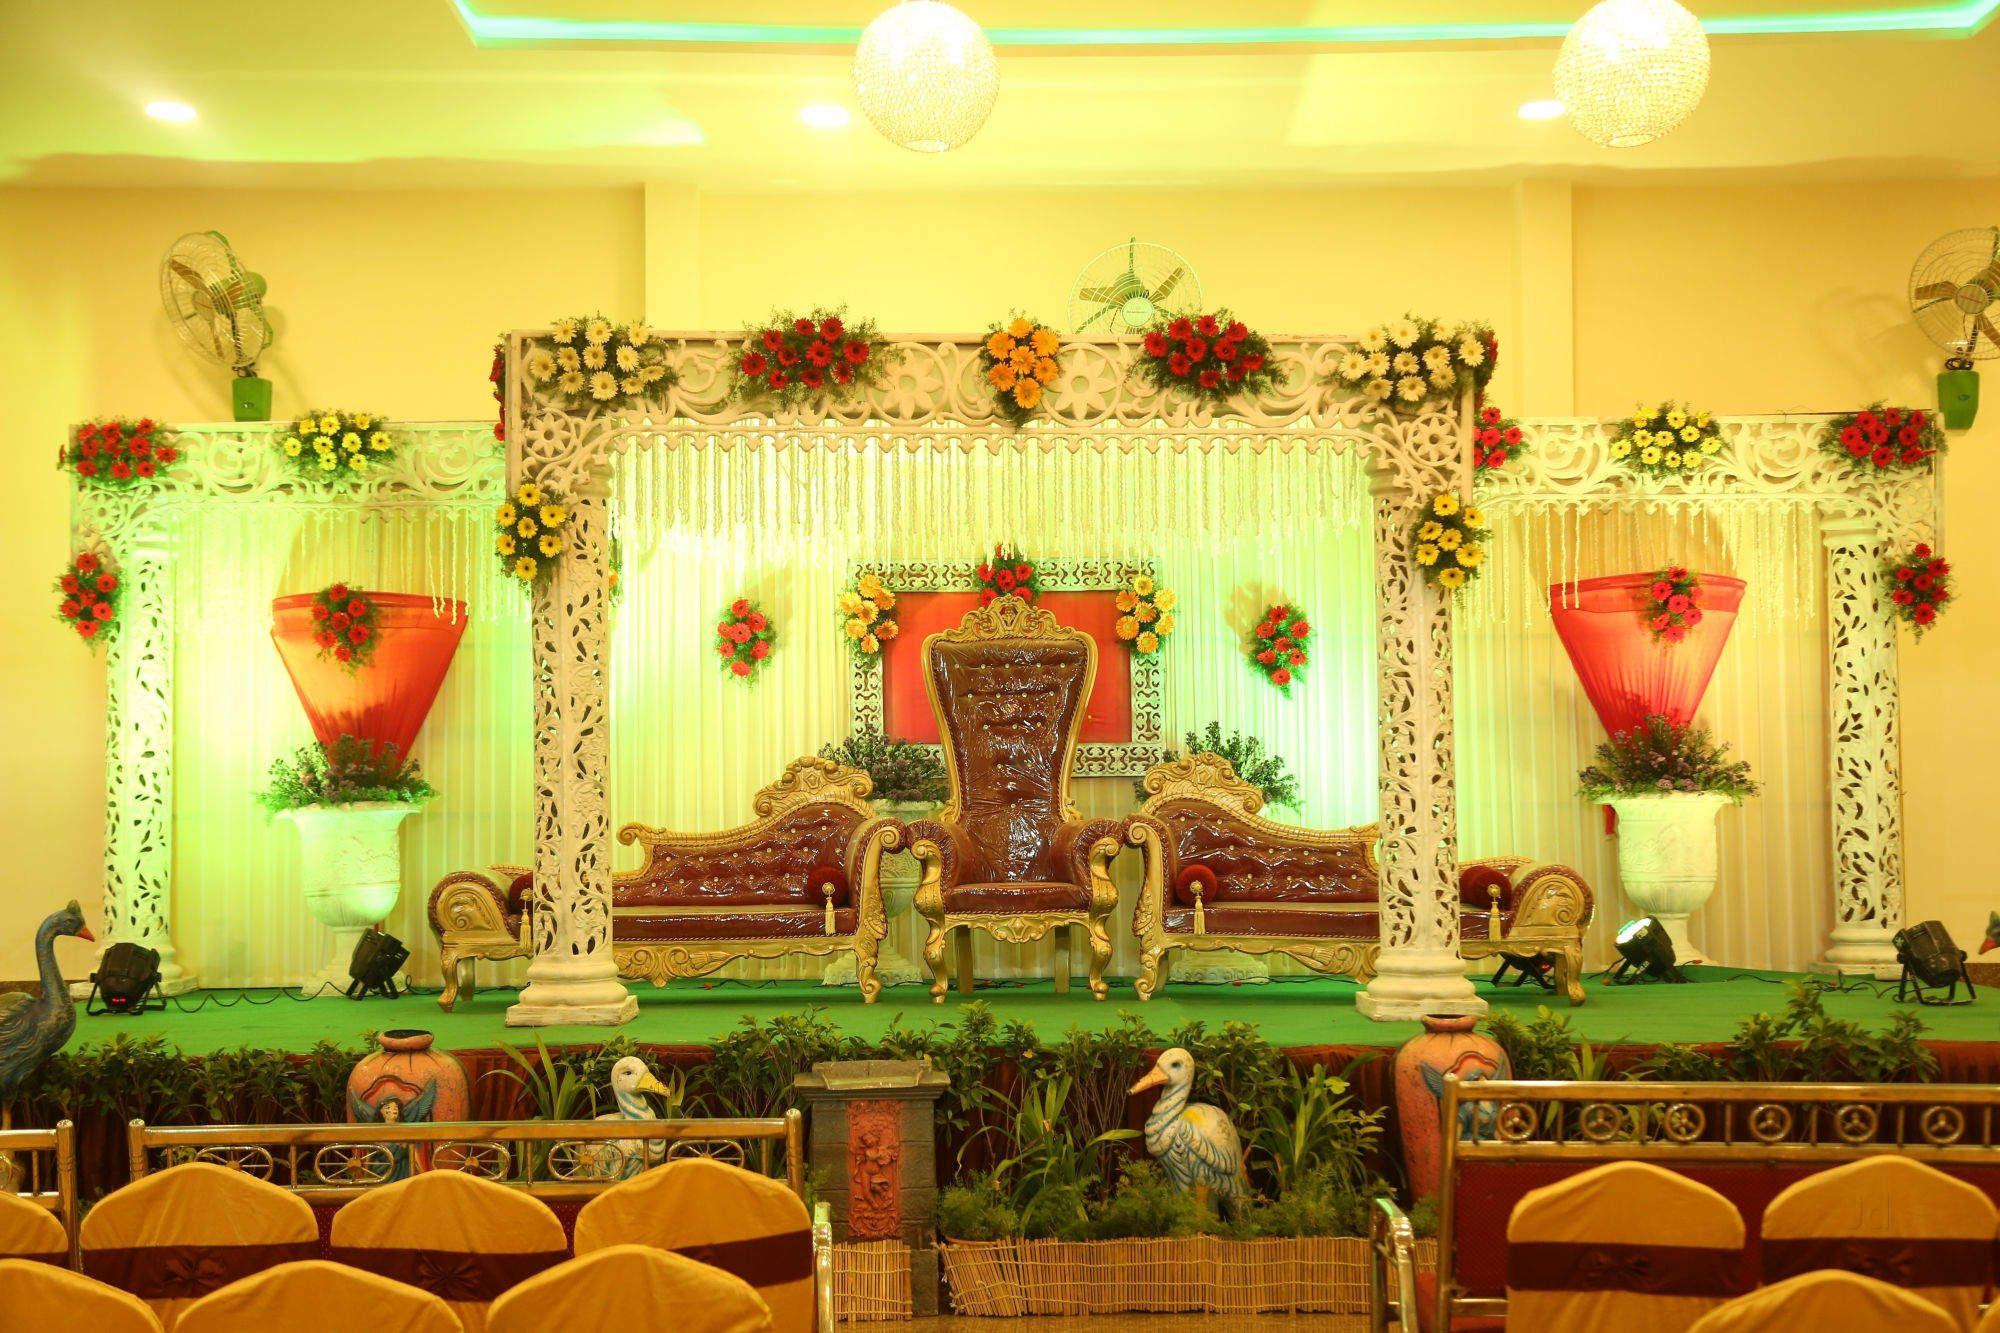 2c3d5a23e03f8b3a2c5ceddc0c27bfad - Image Gardens Function Hall Hyderabad Telangana